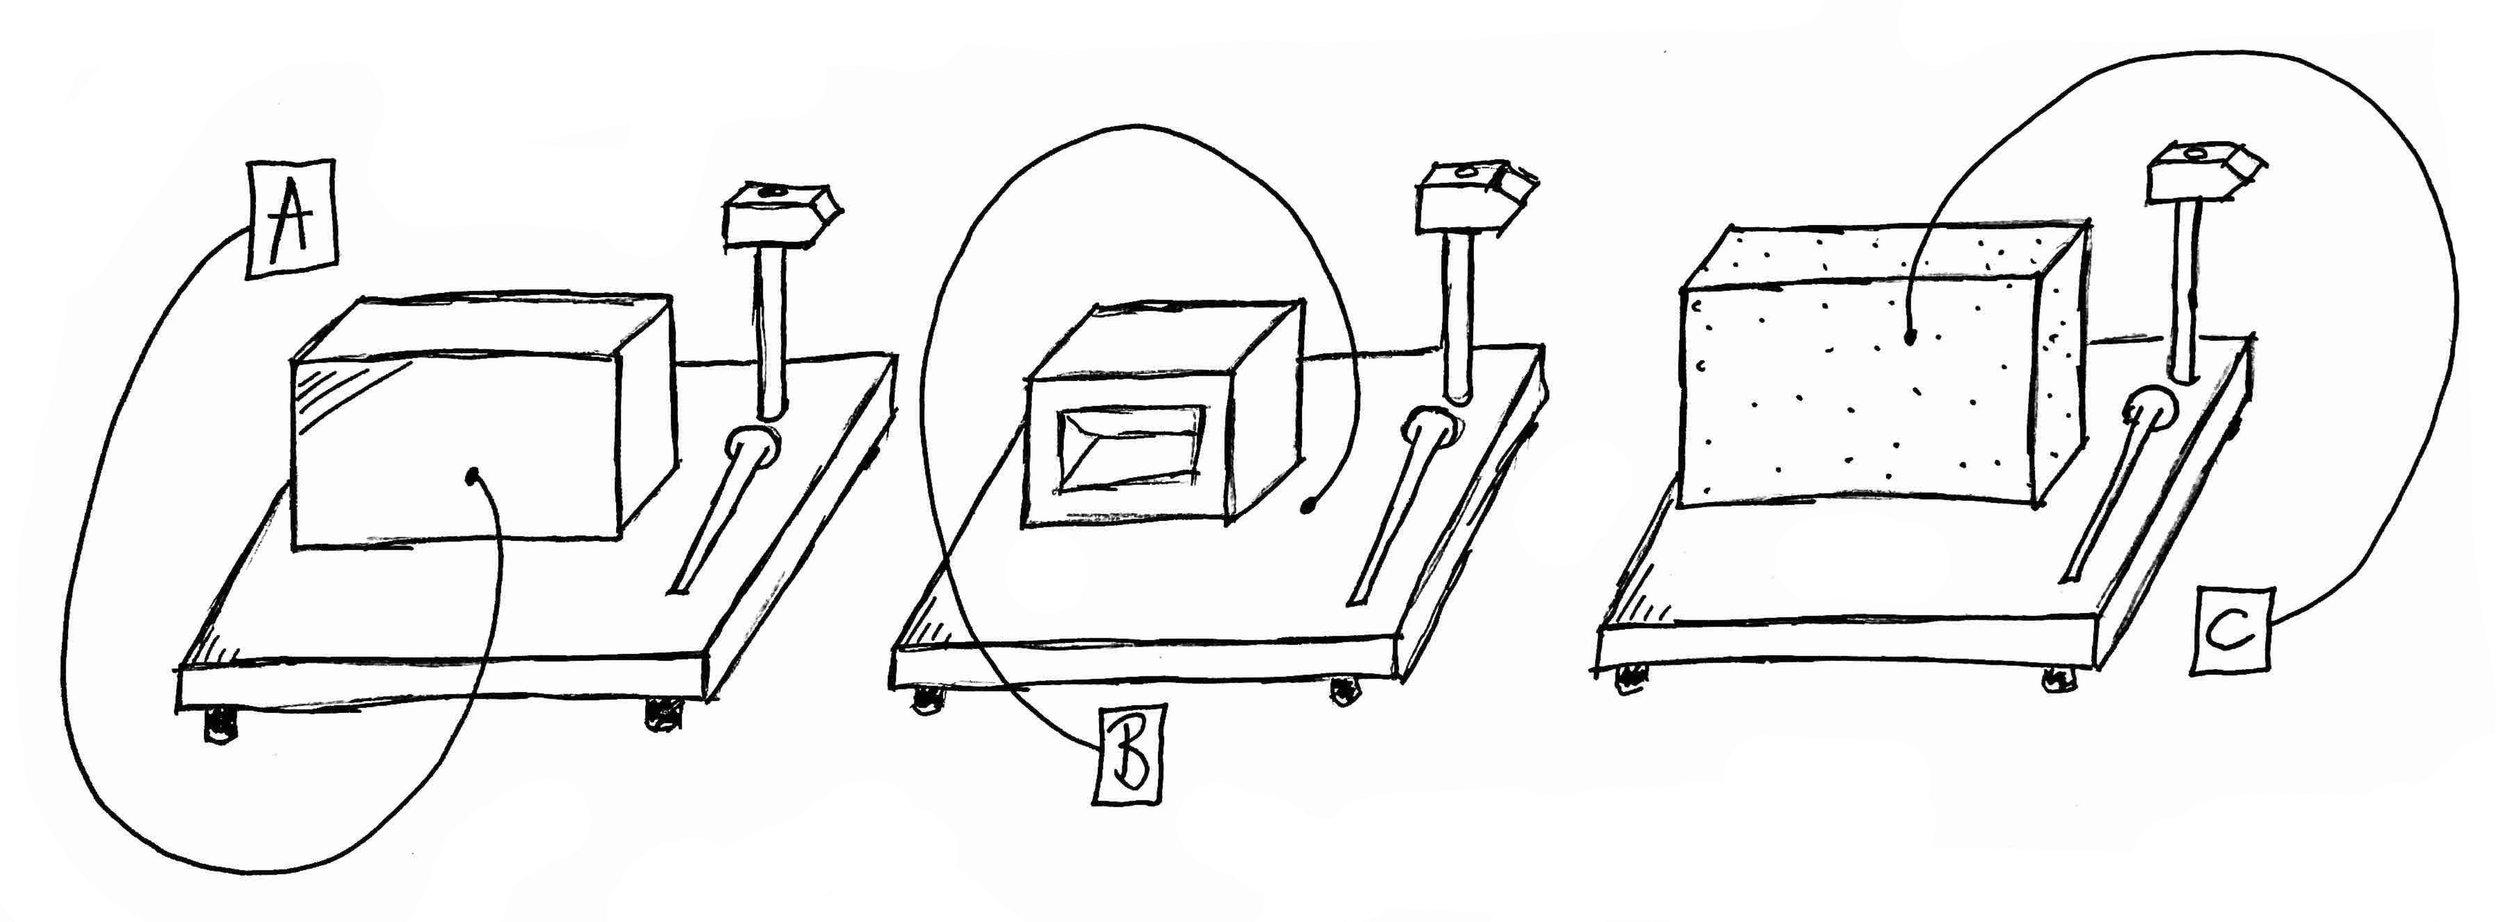 #02_diagram_scaled.jpg